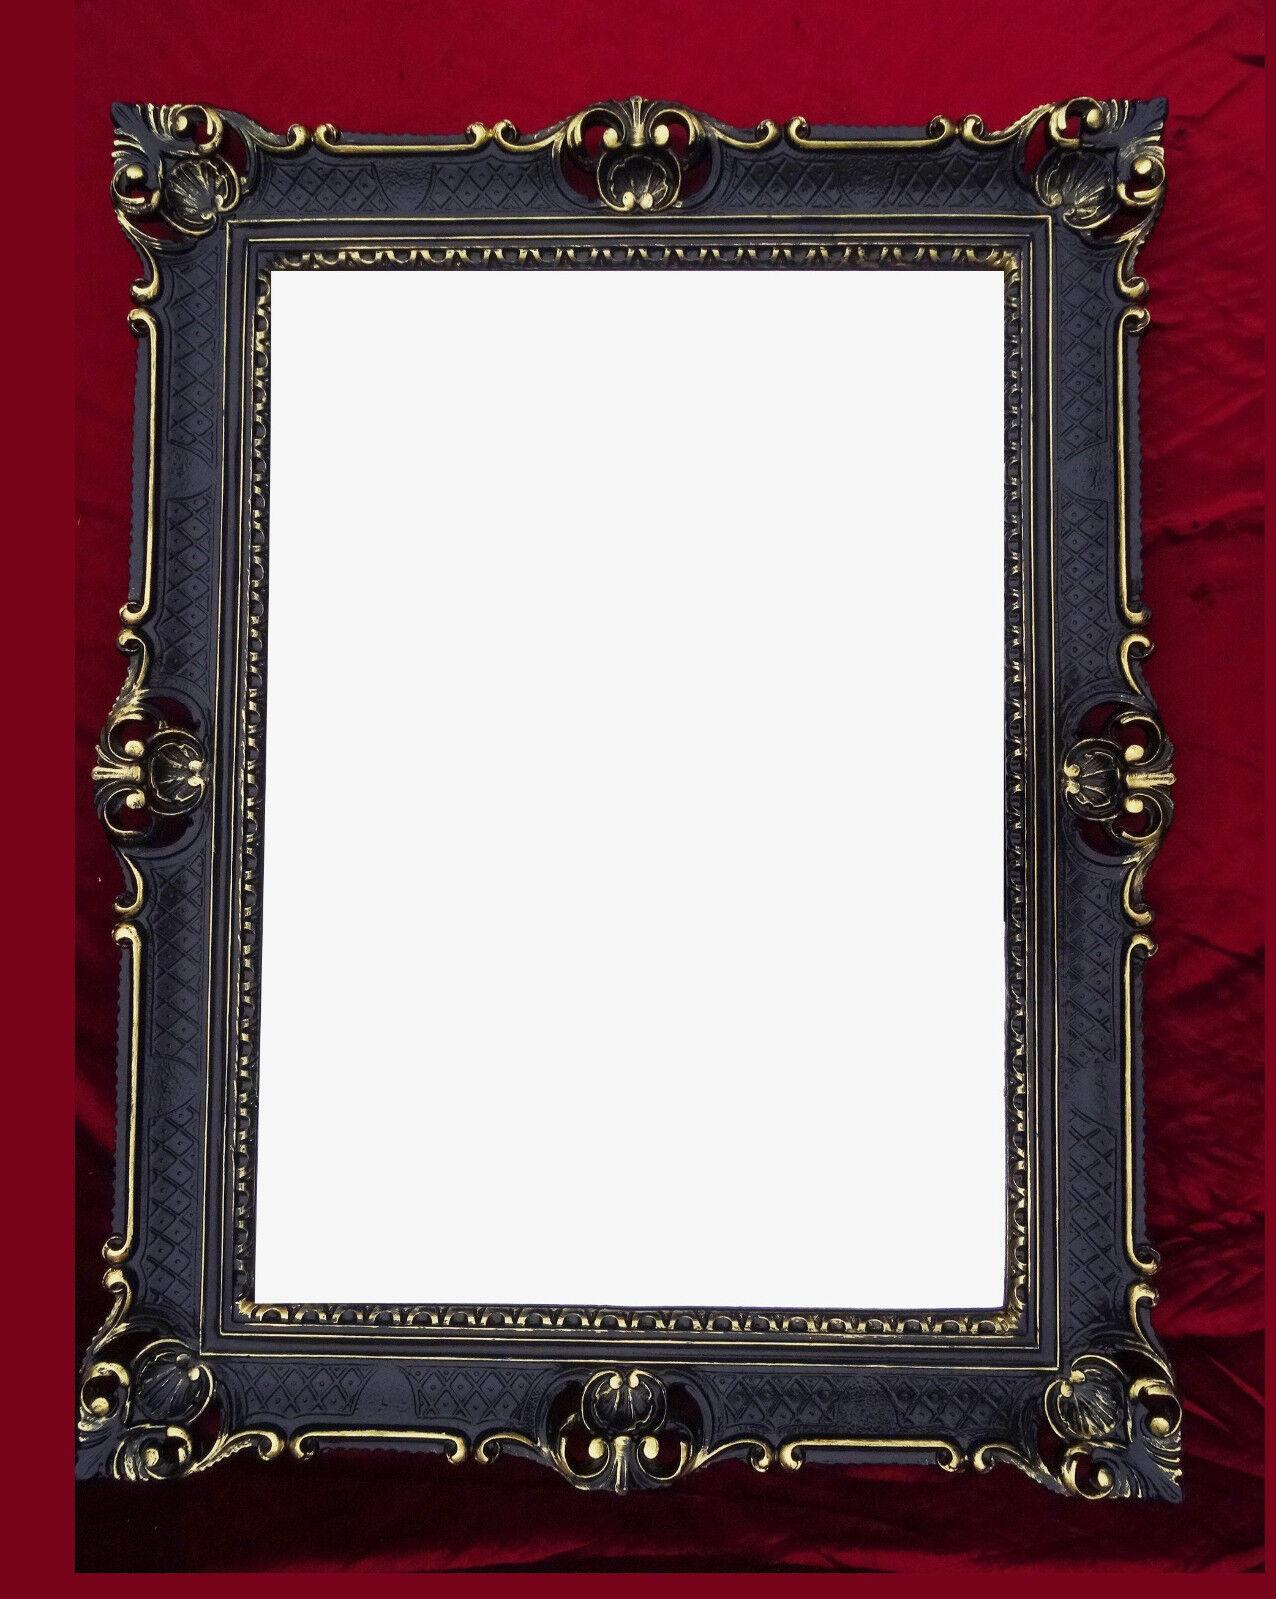 Wandspiegel schwarz gold antik barock rokoko 90x70 rahmen for Couchtisch 90x70